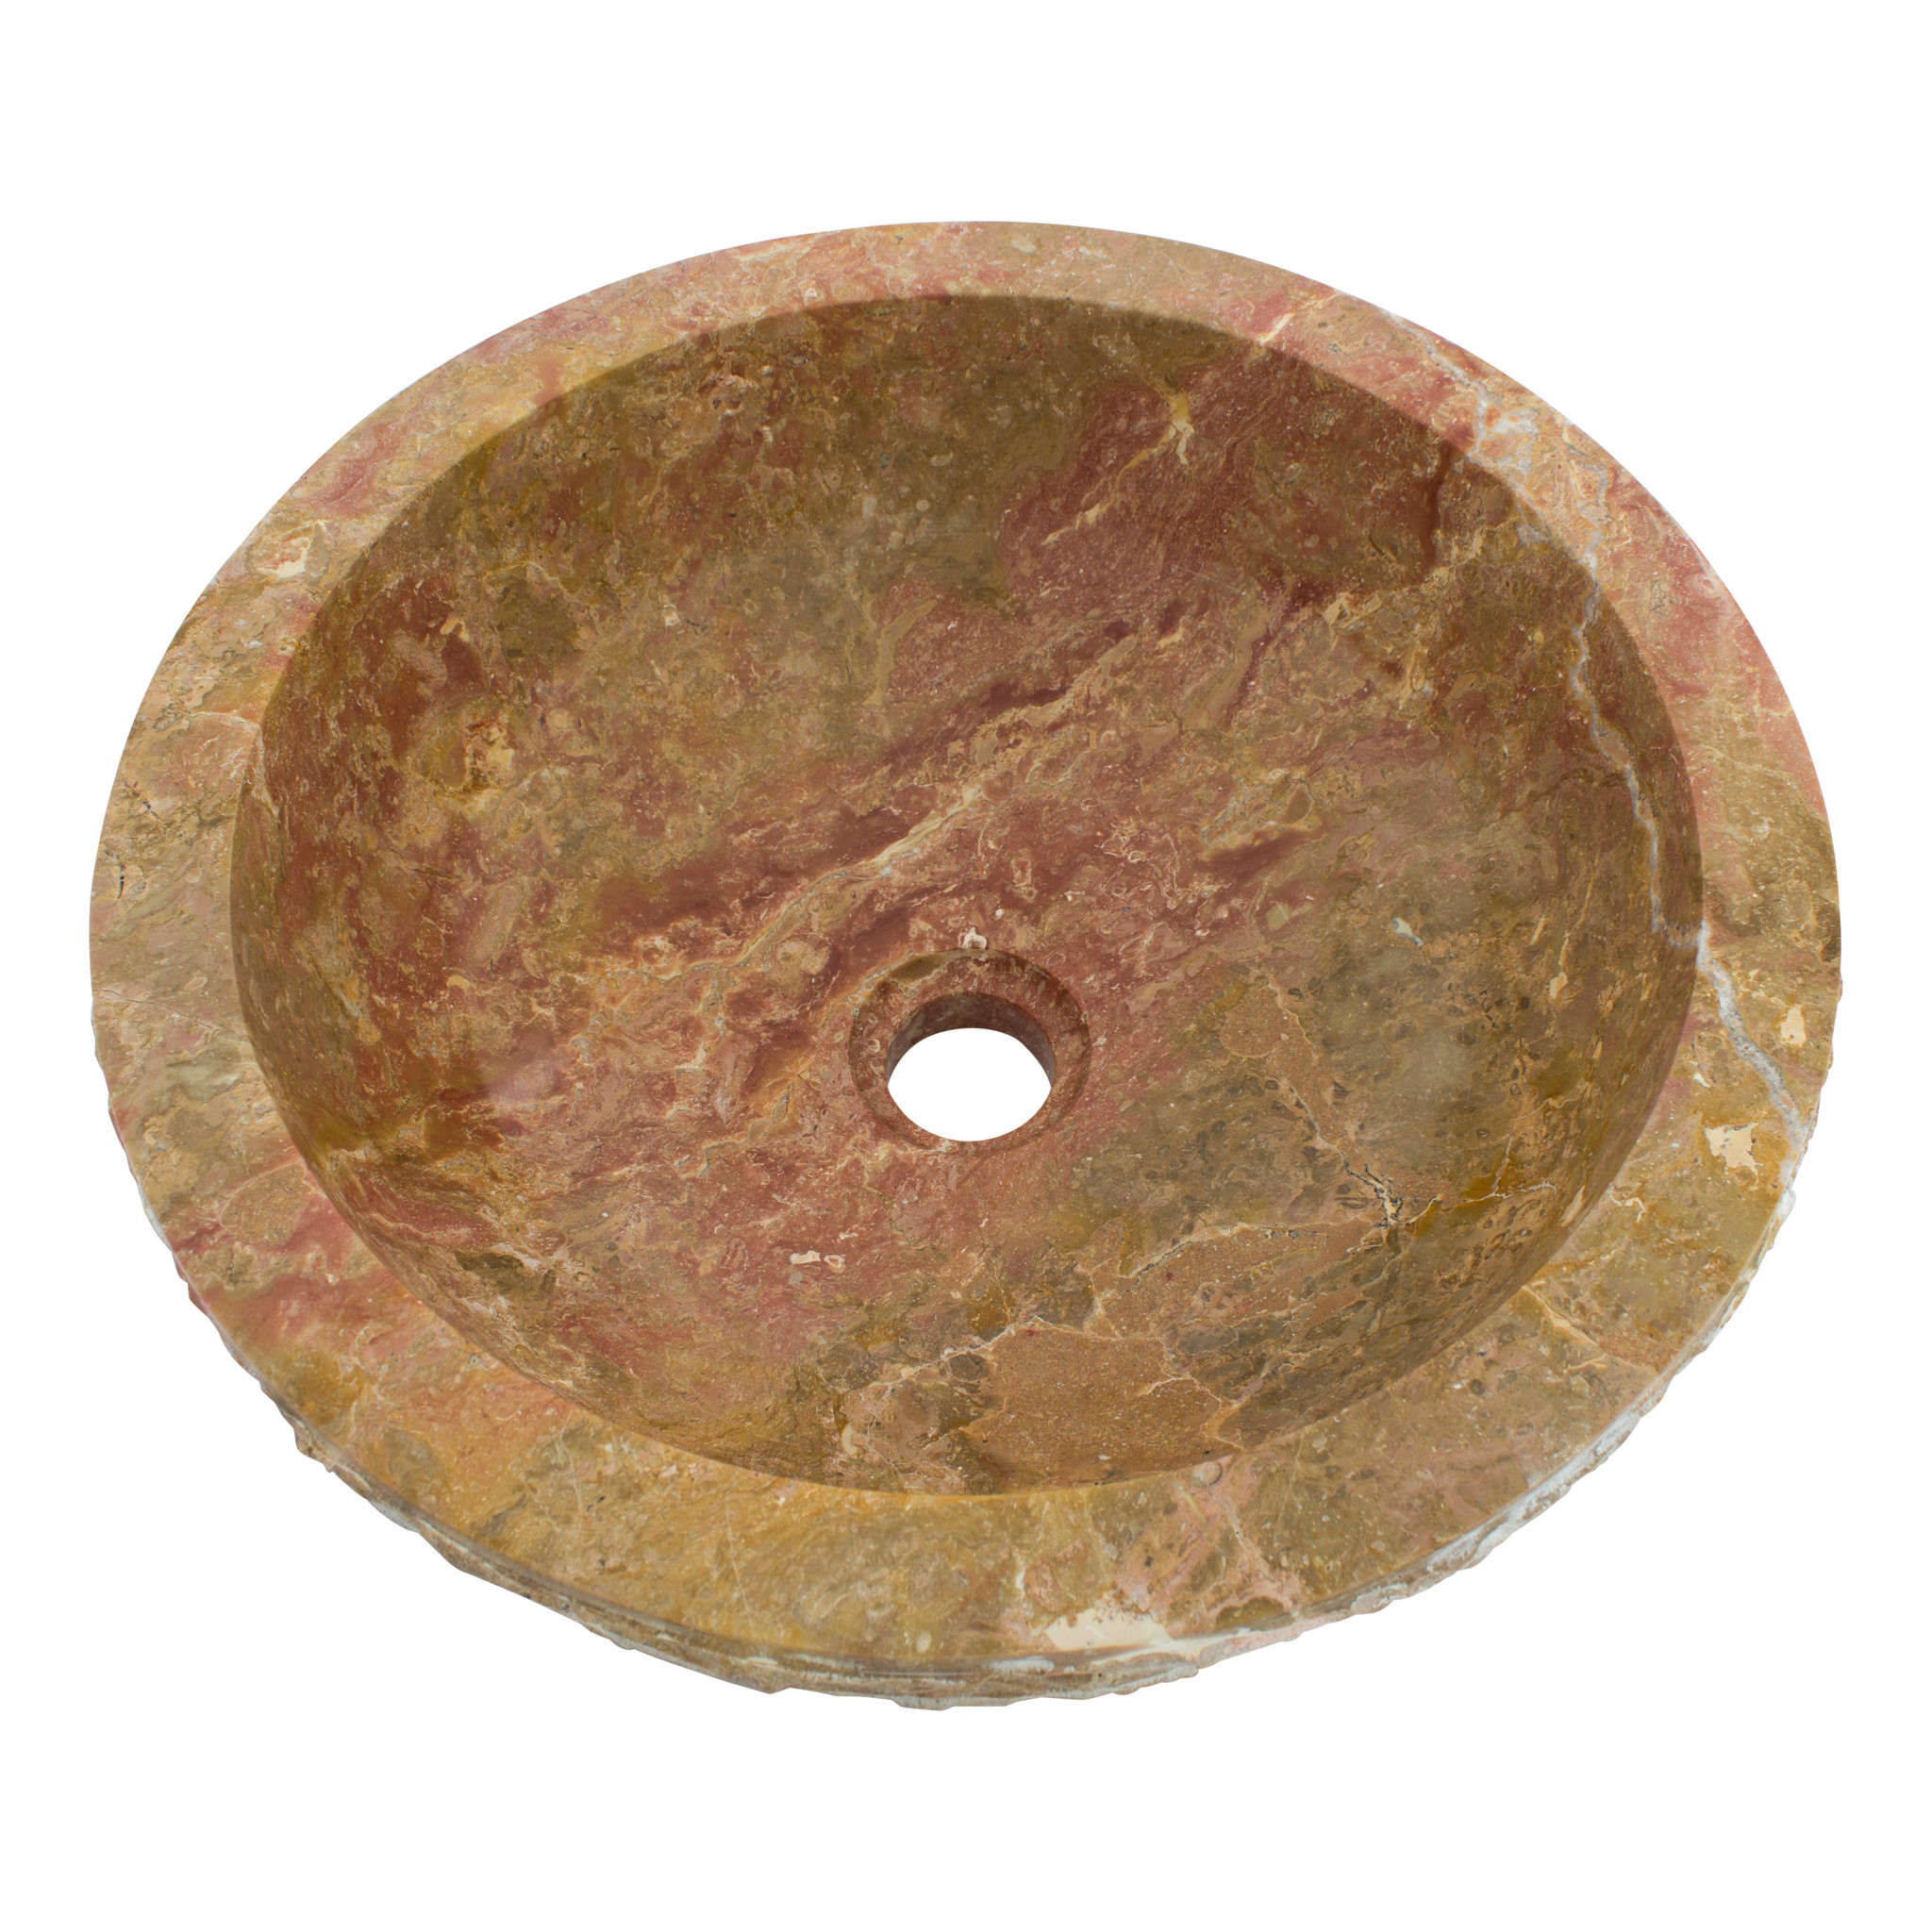 Indomarmer Rotem Marmor Waschbecken Marmo Ø 40 x H 15 cm